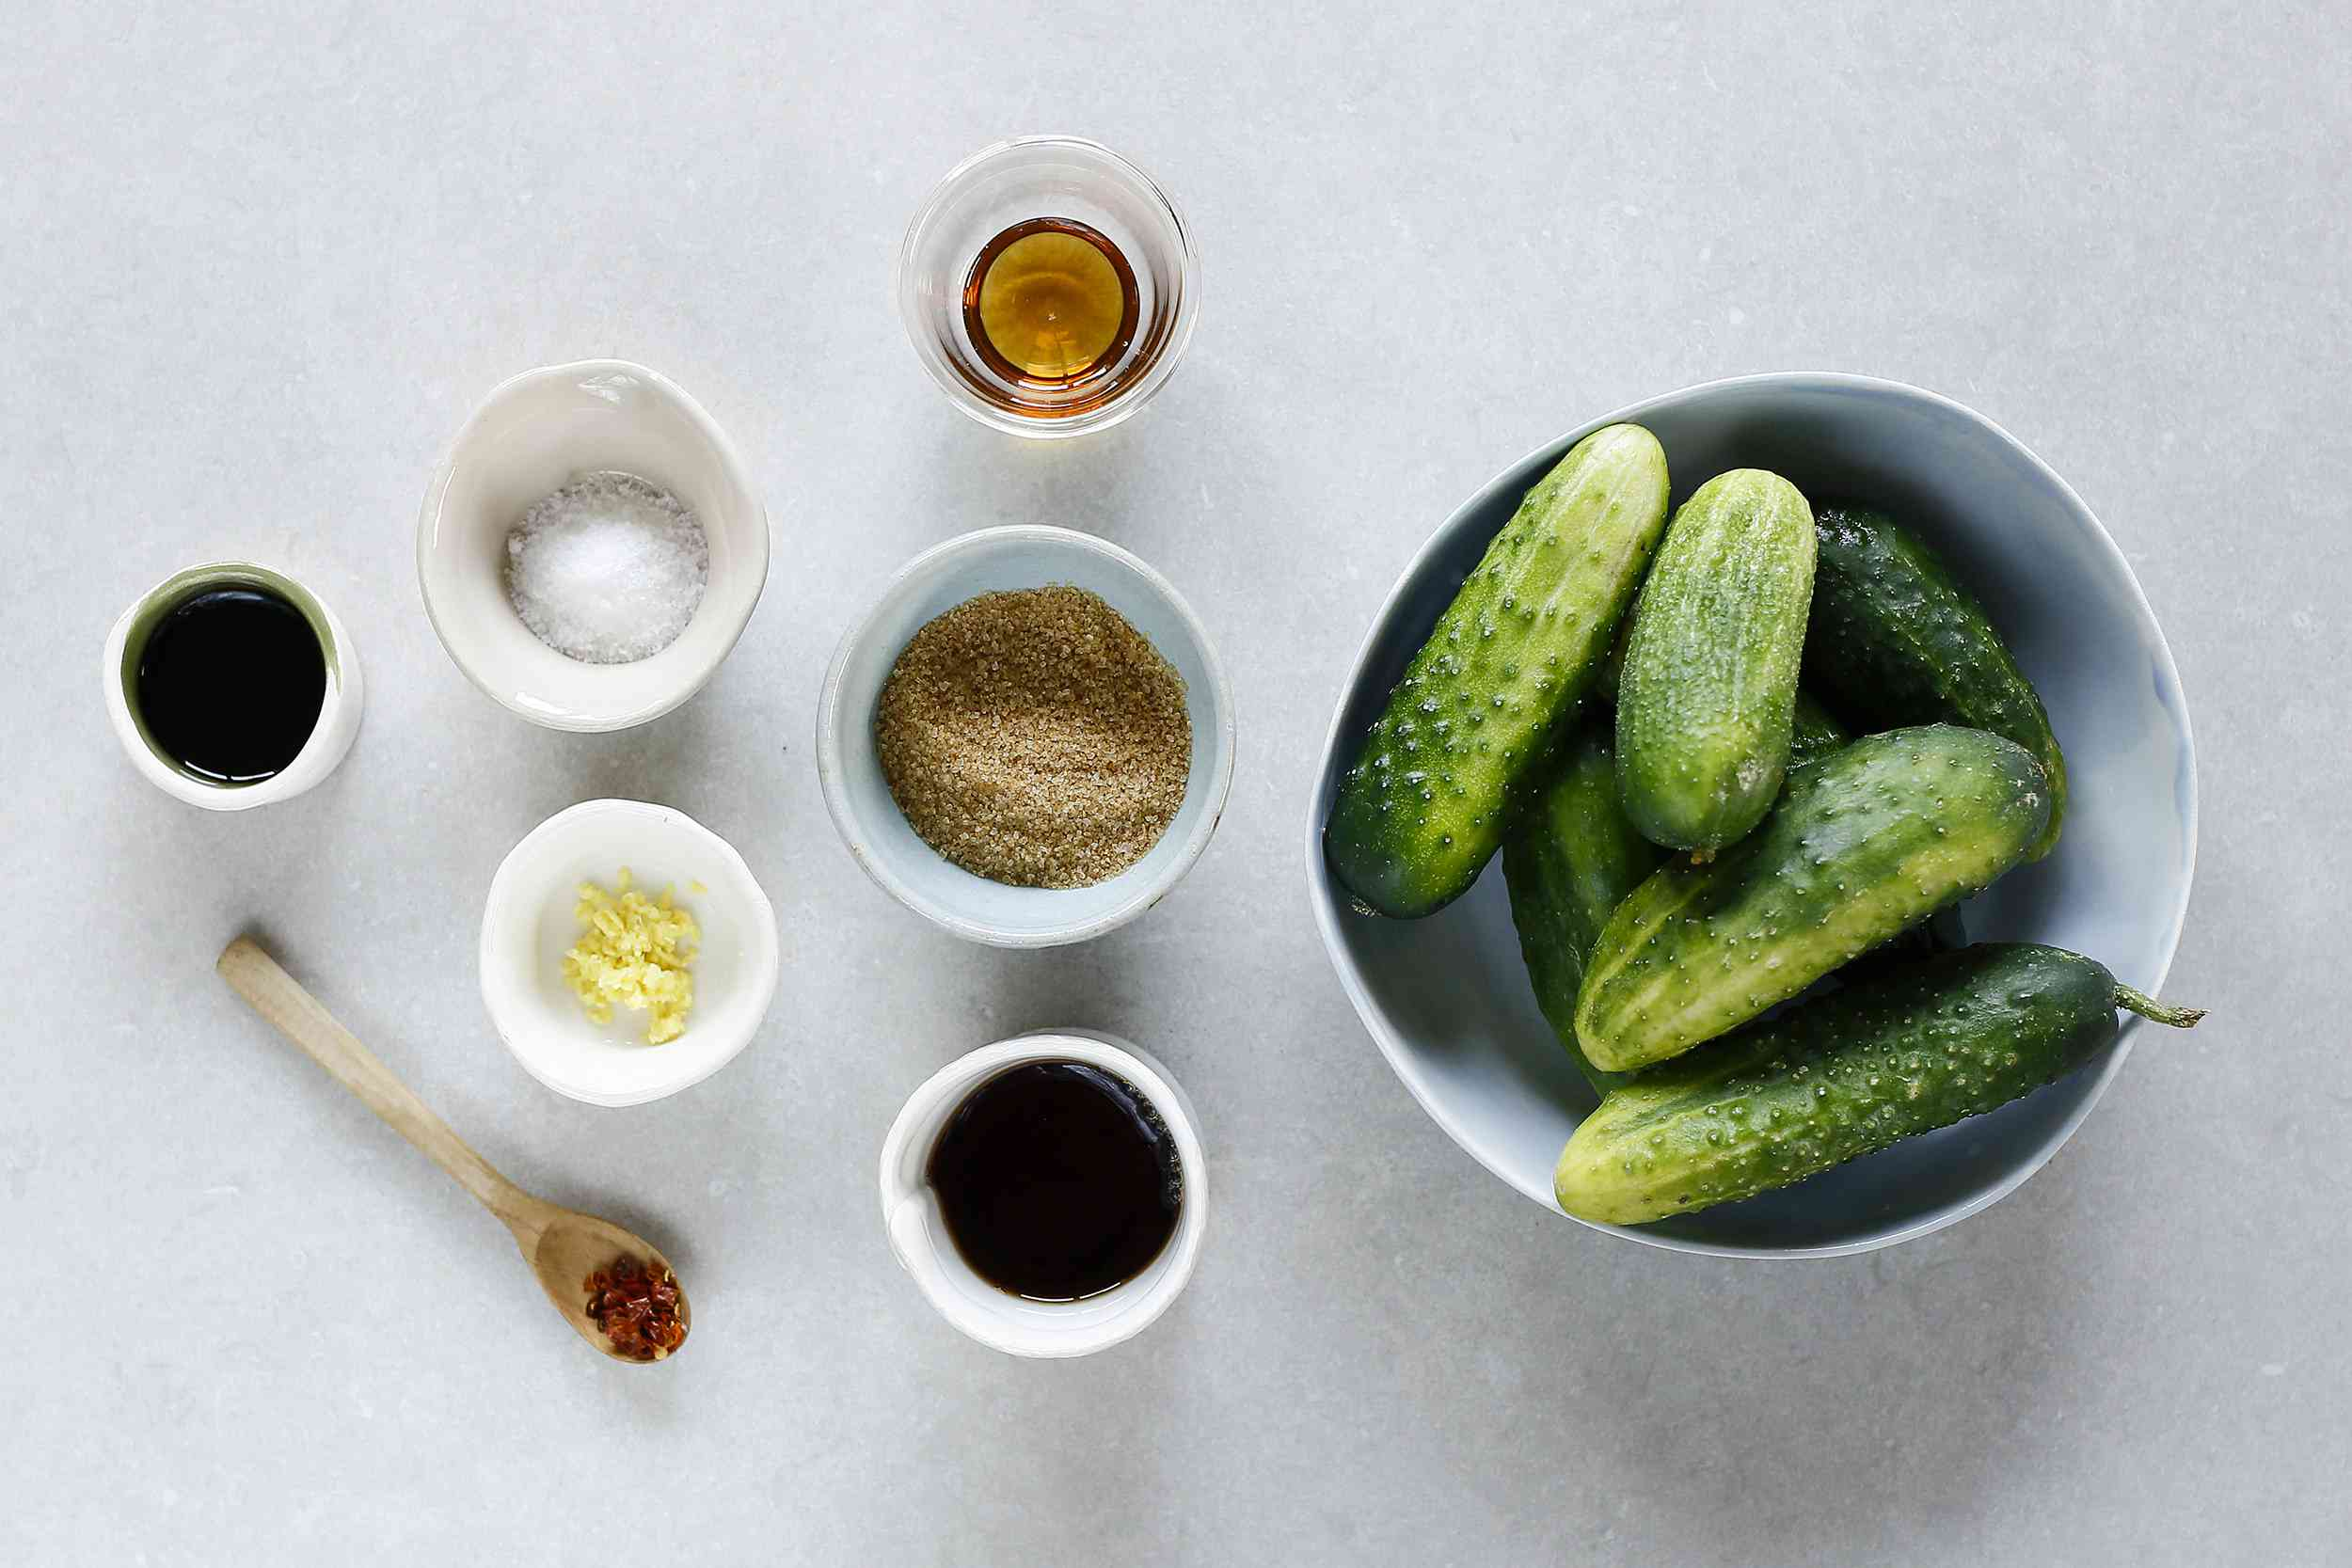 Chinese Cucumber Salad ingredients